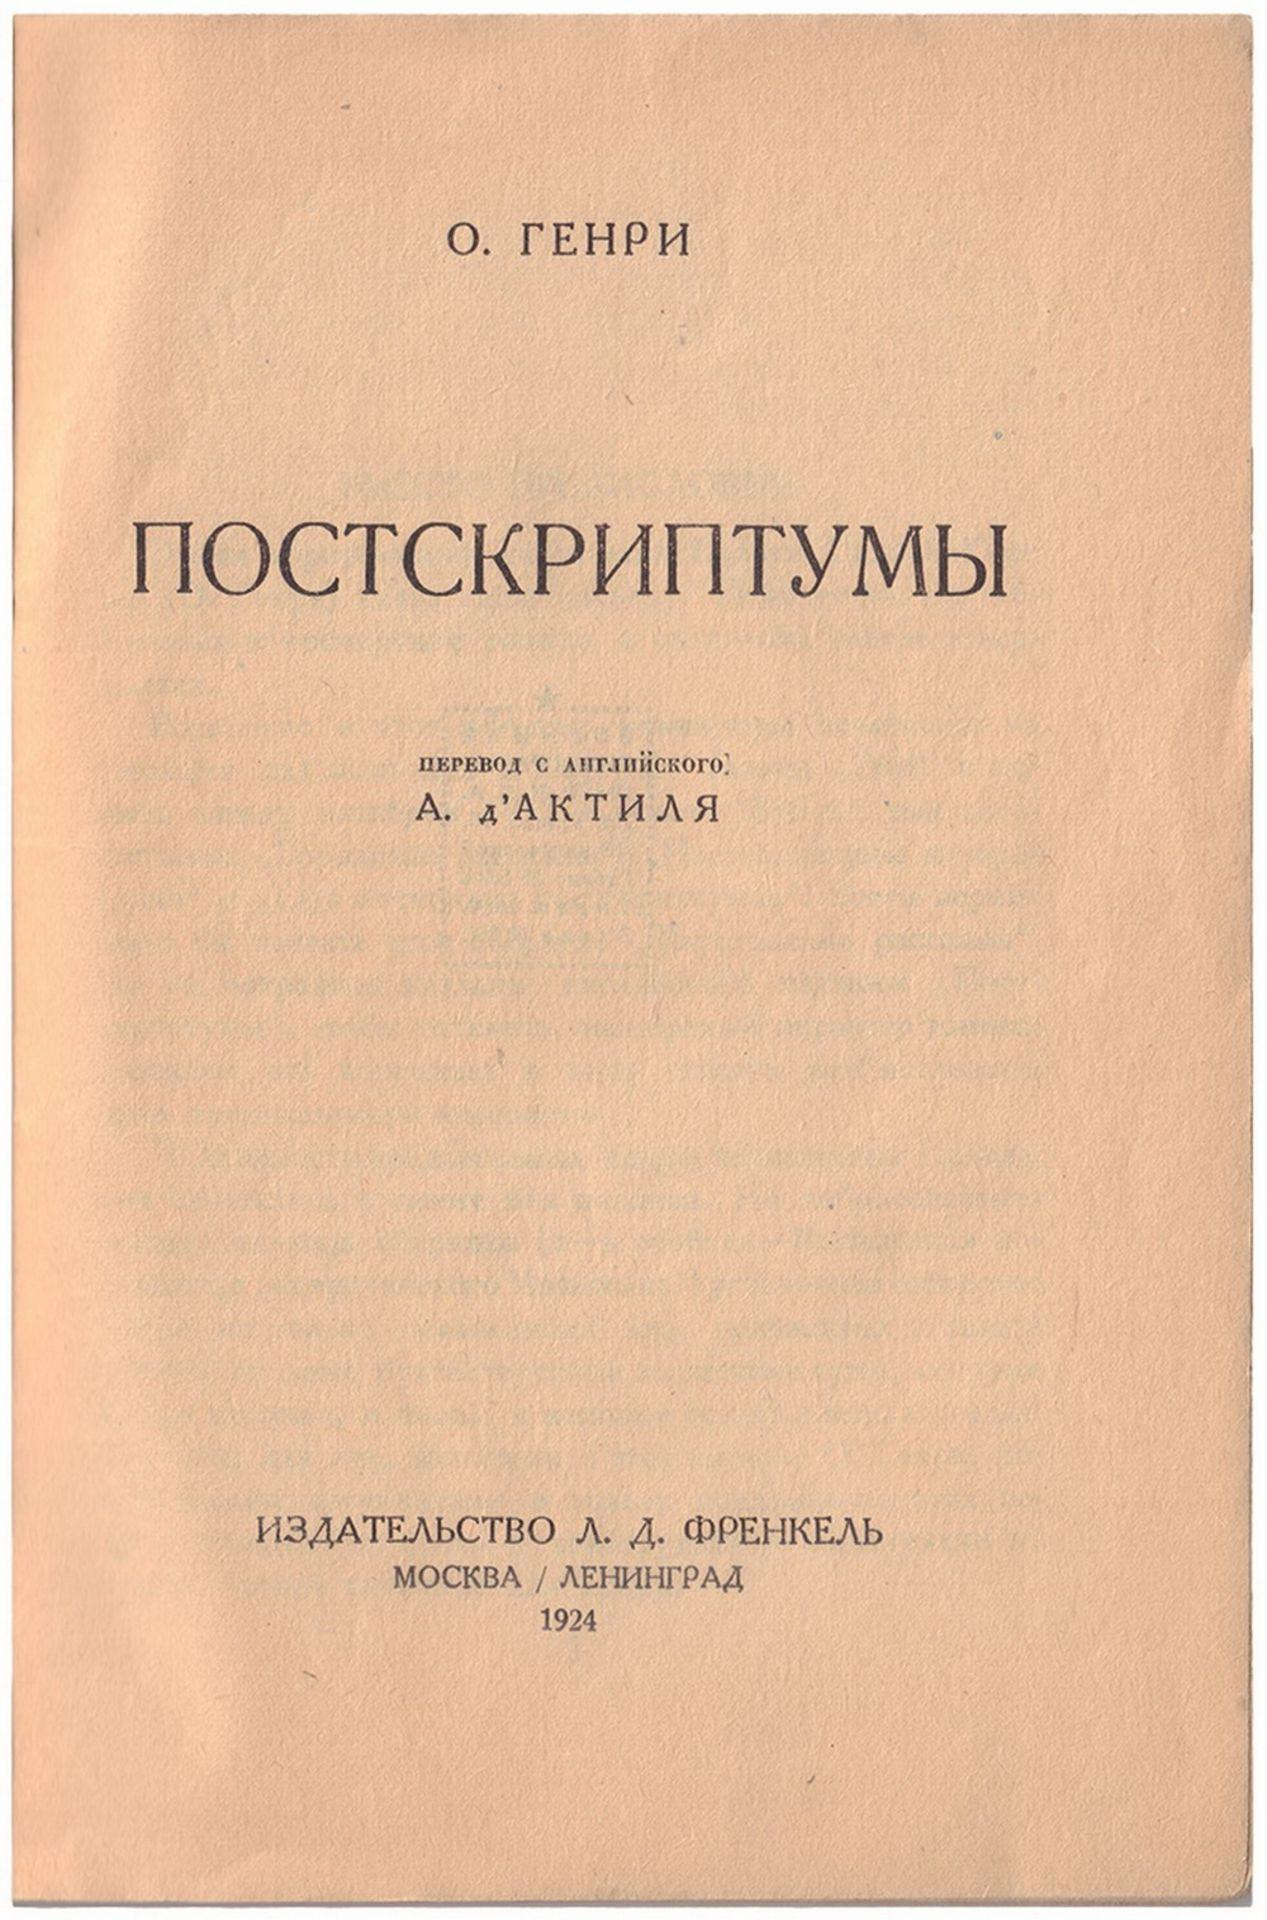 [Constructivist cover. Soviet art]. O. Henry. Some postscripts: [Novels]. - Moscow, Leningrad, 1924. - Bild 2 aus 2